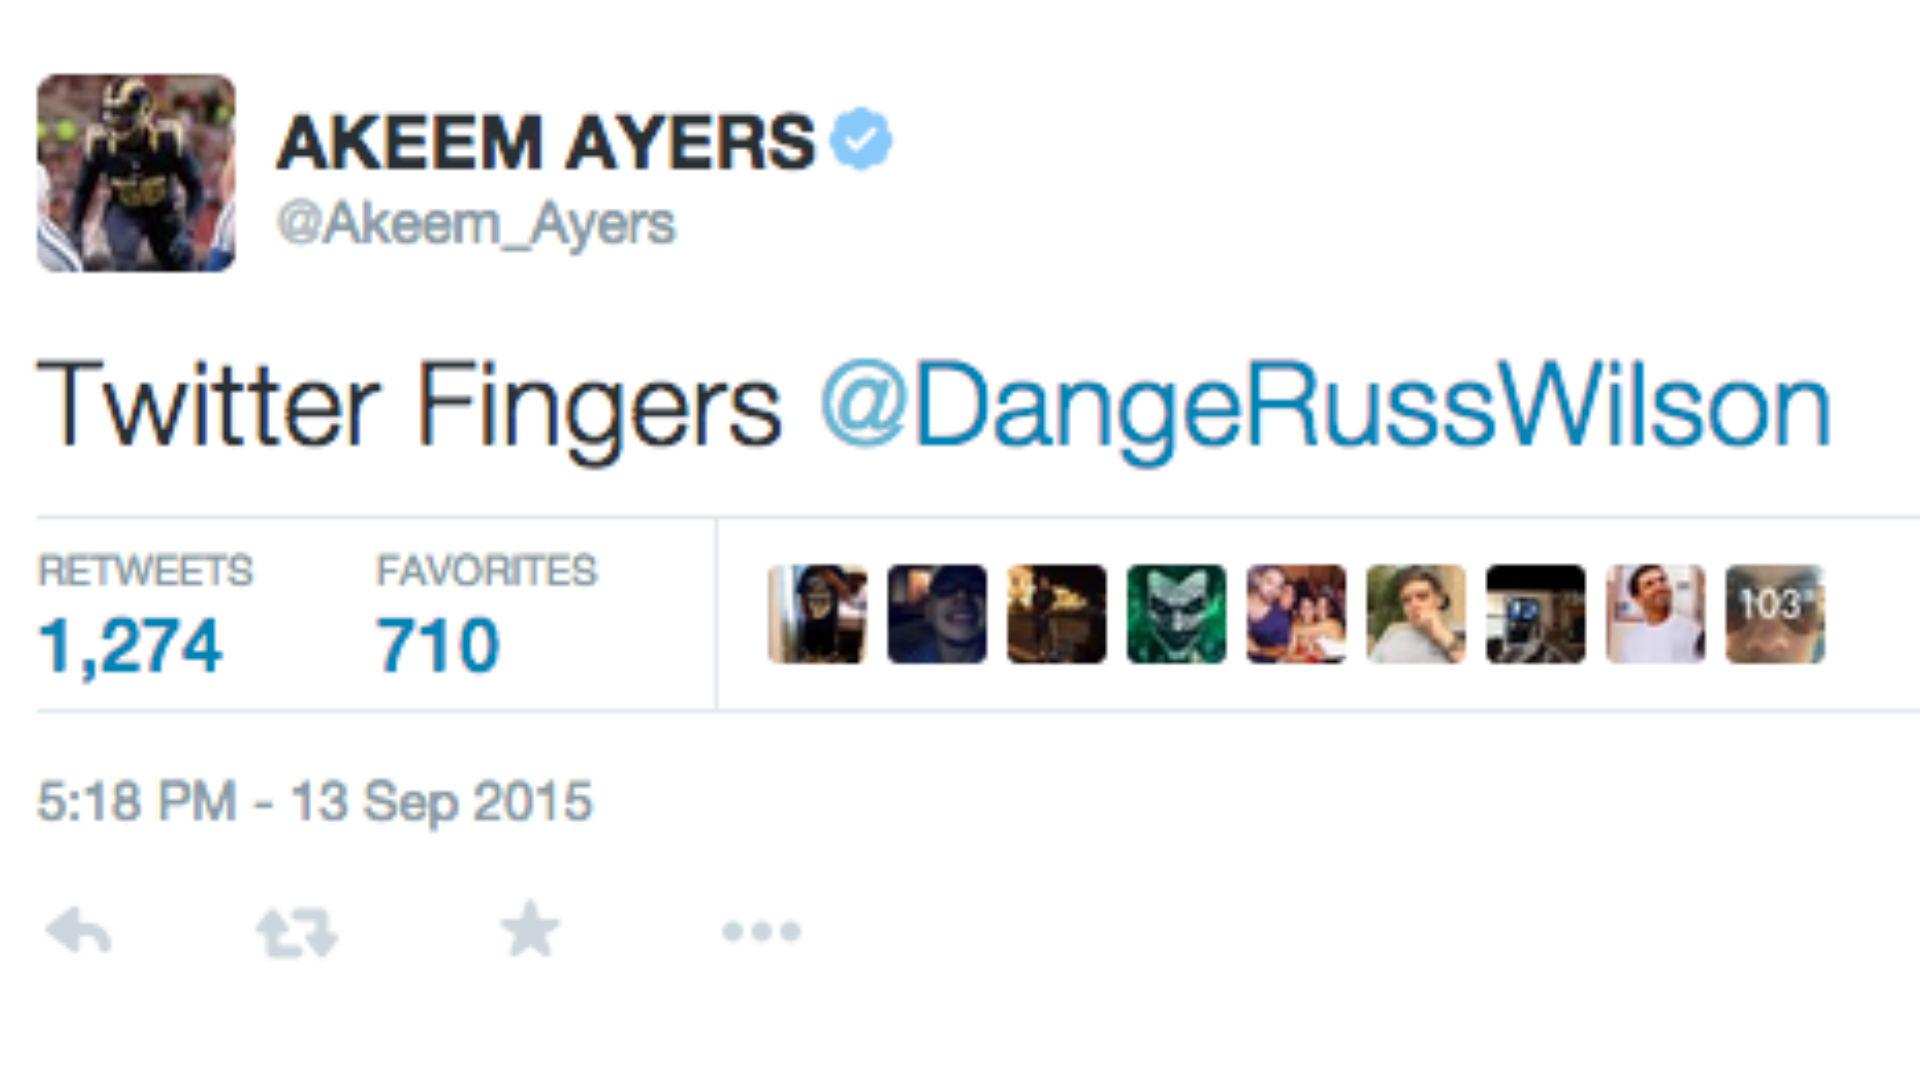 akeem-ayers-tweet-ftr-091315.jpg